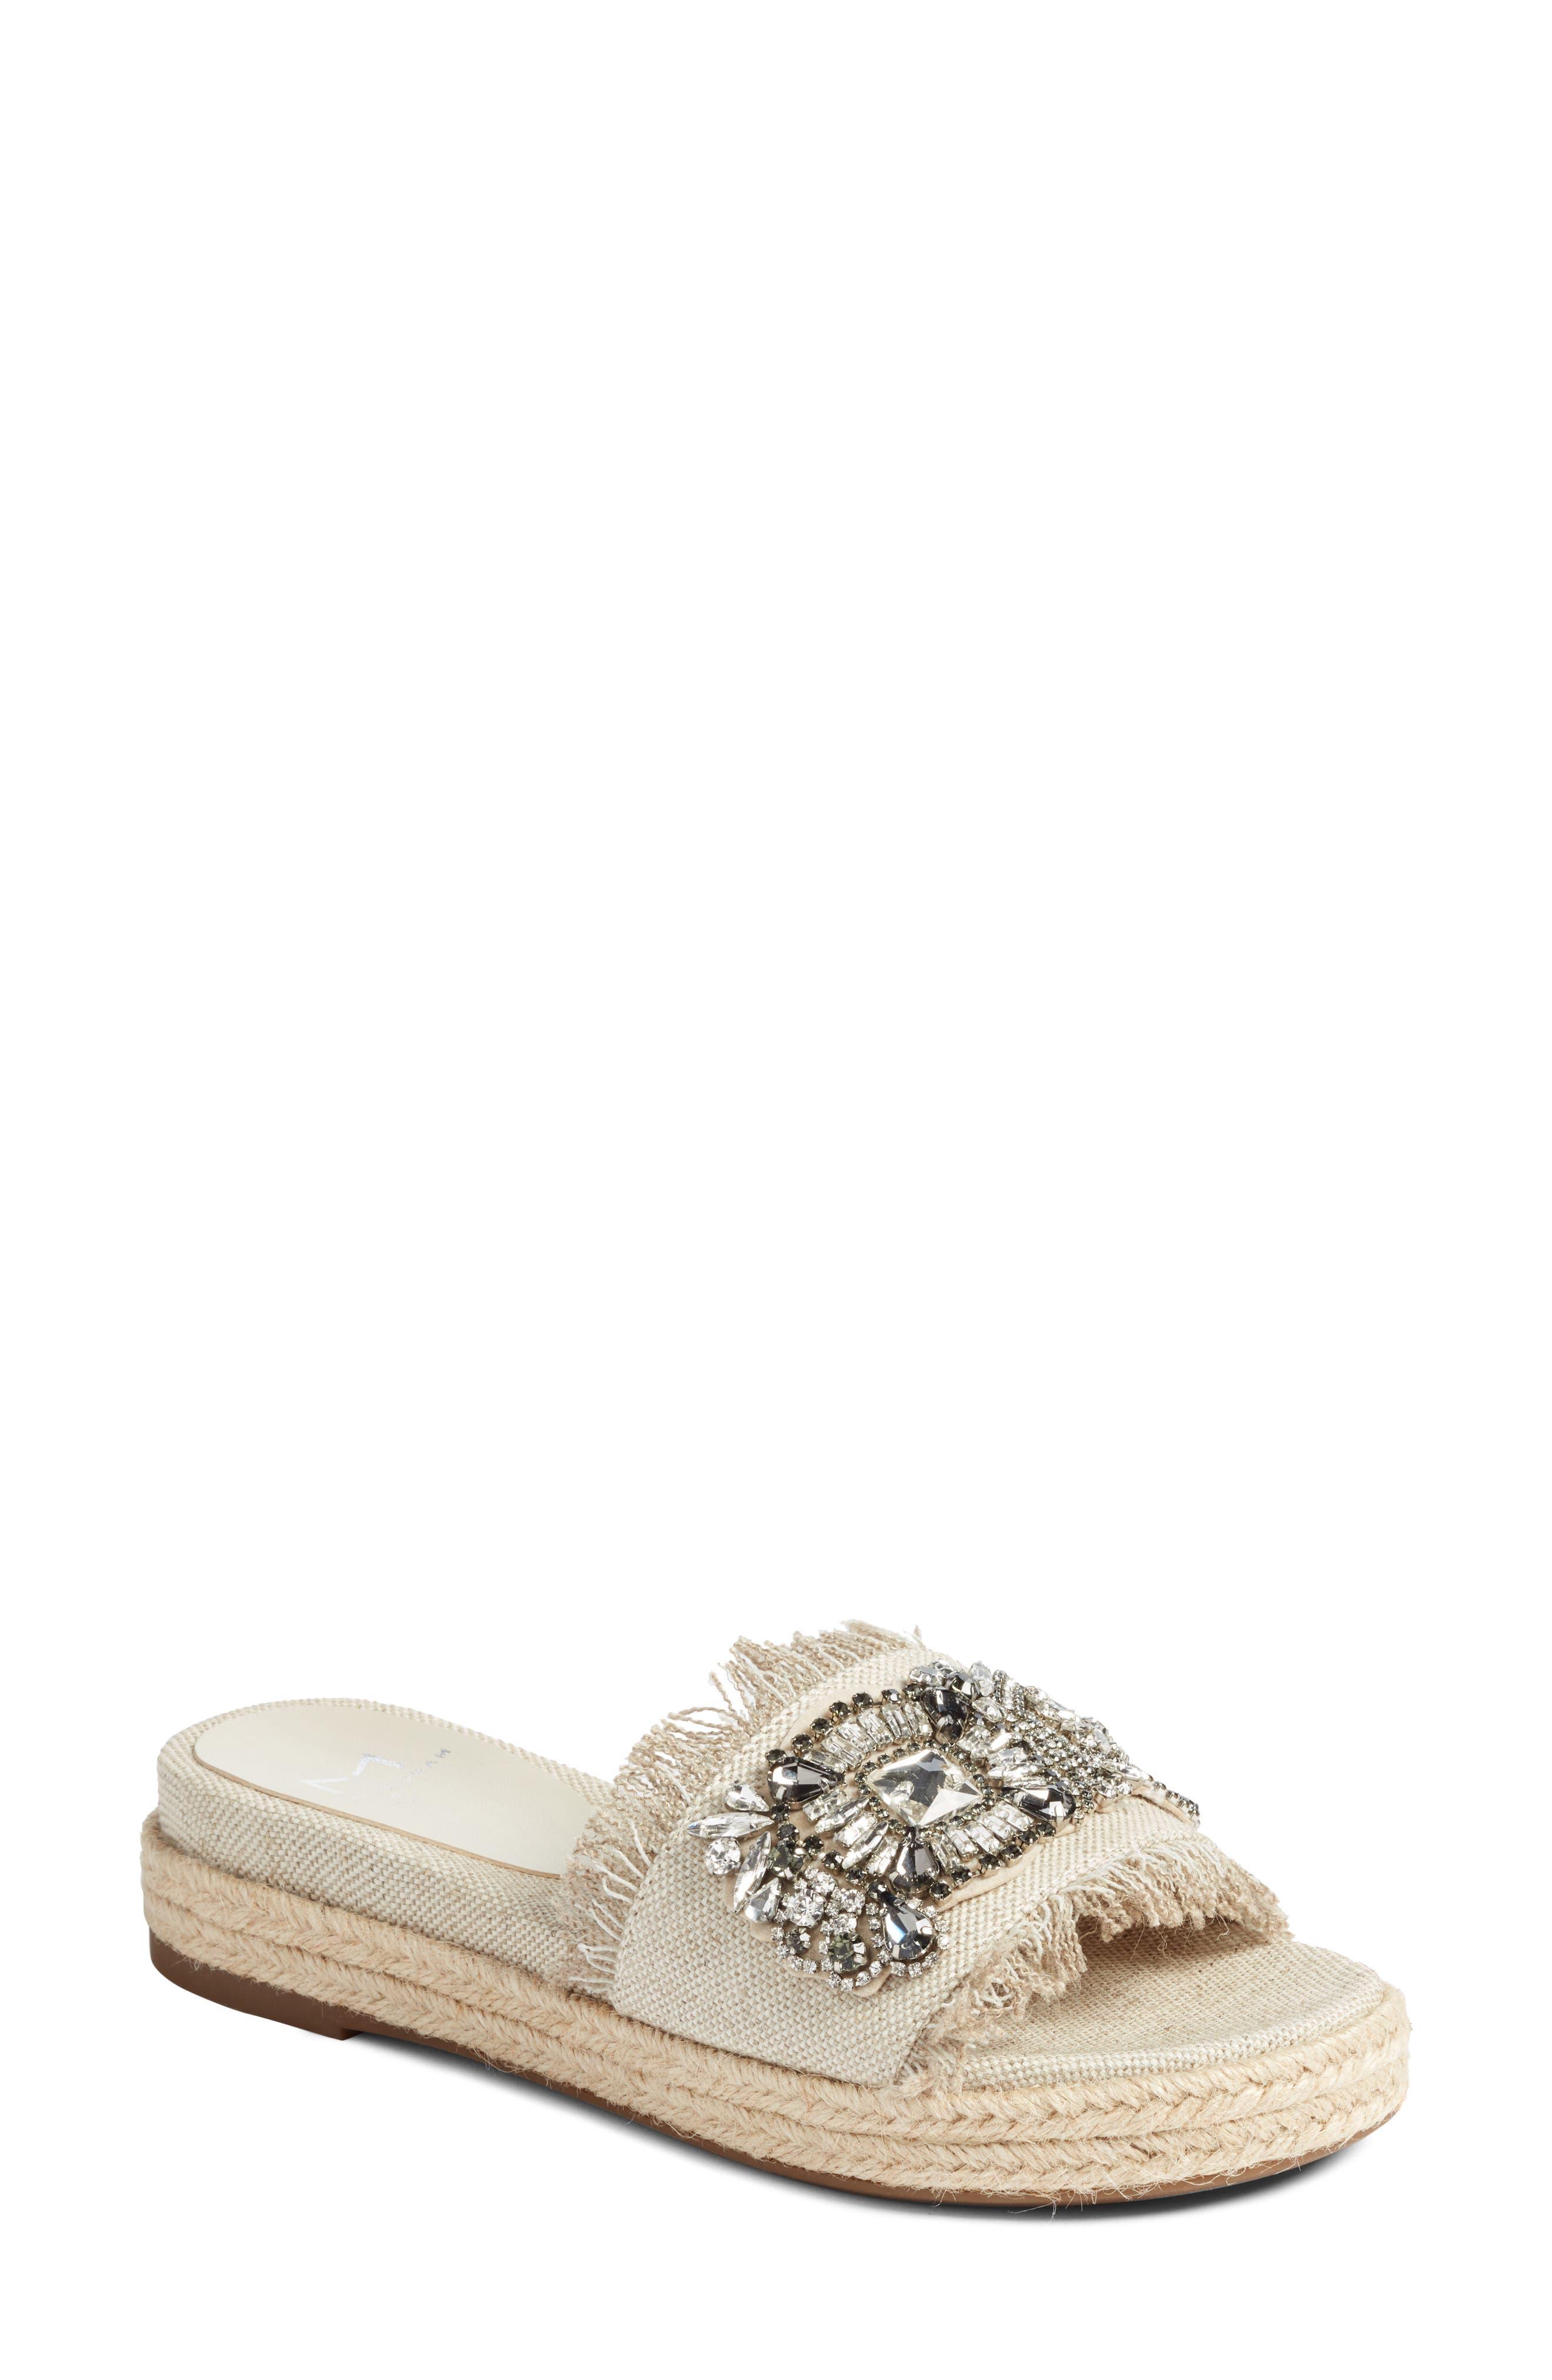 Alternate Image 1 Selected - Marc Fisher LTD Jelly II Embellished Sandal (Women)